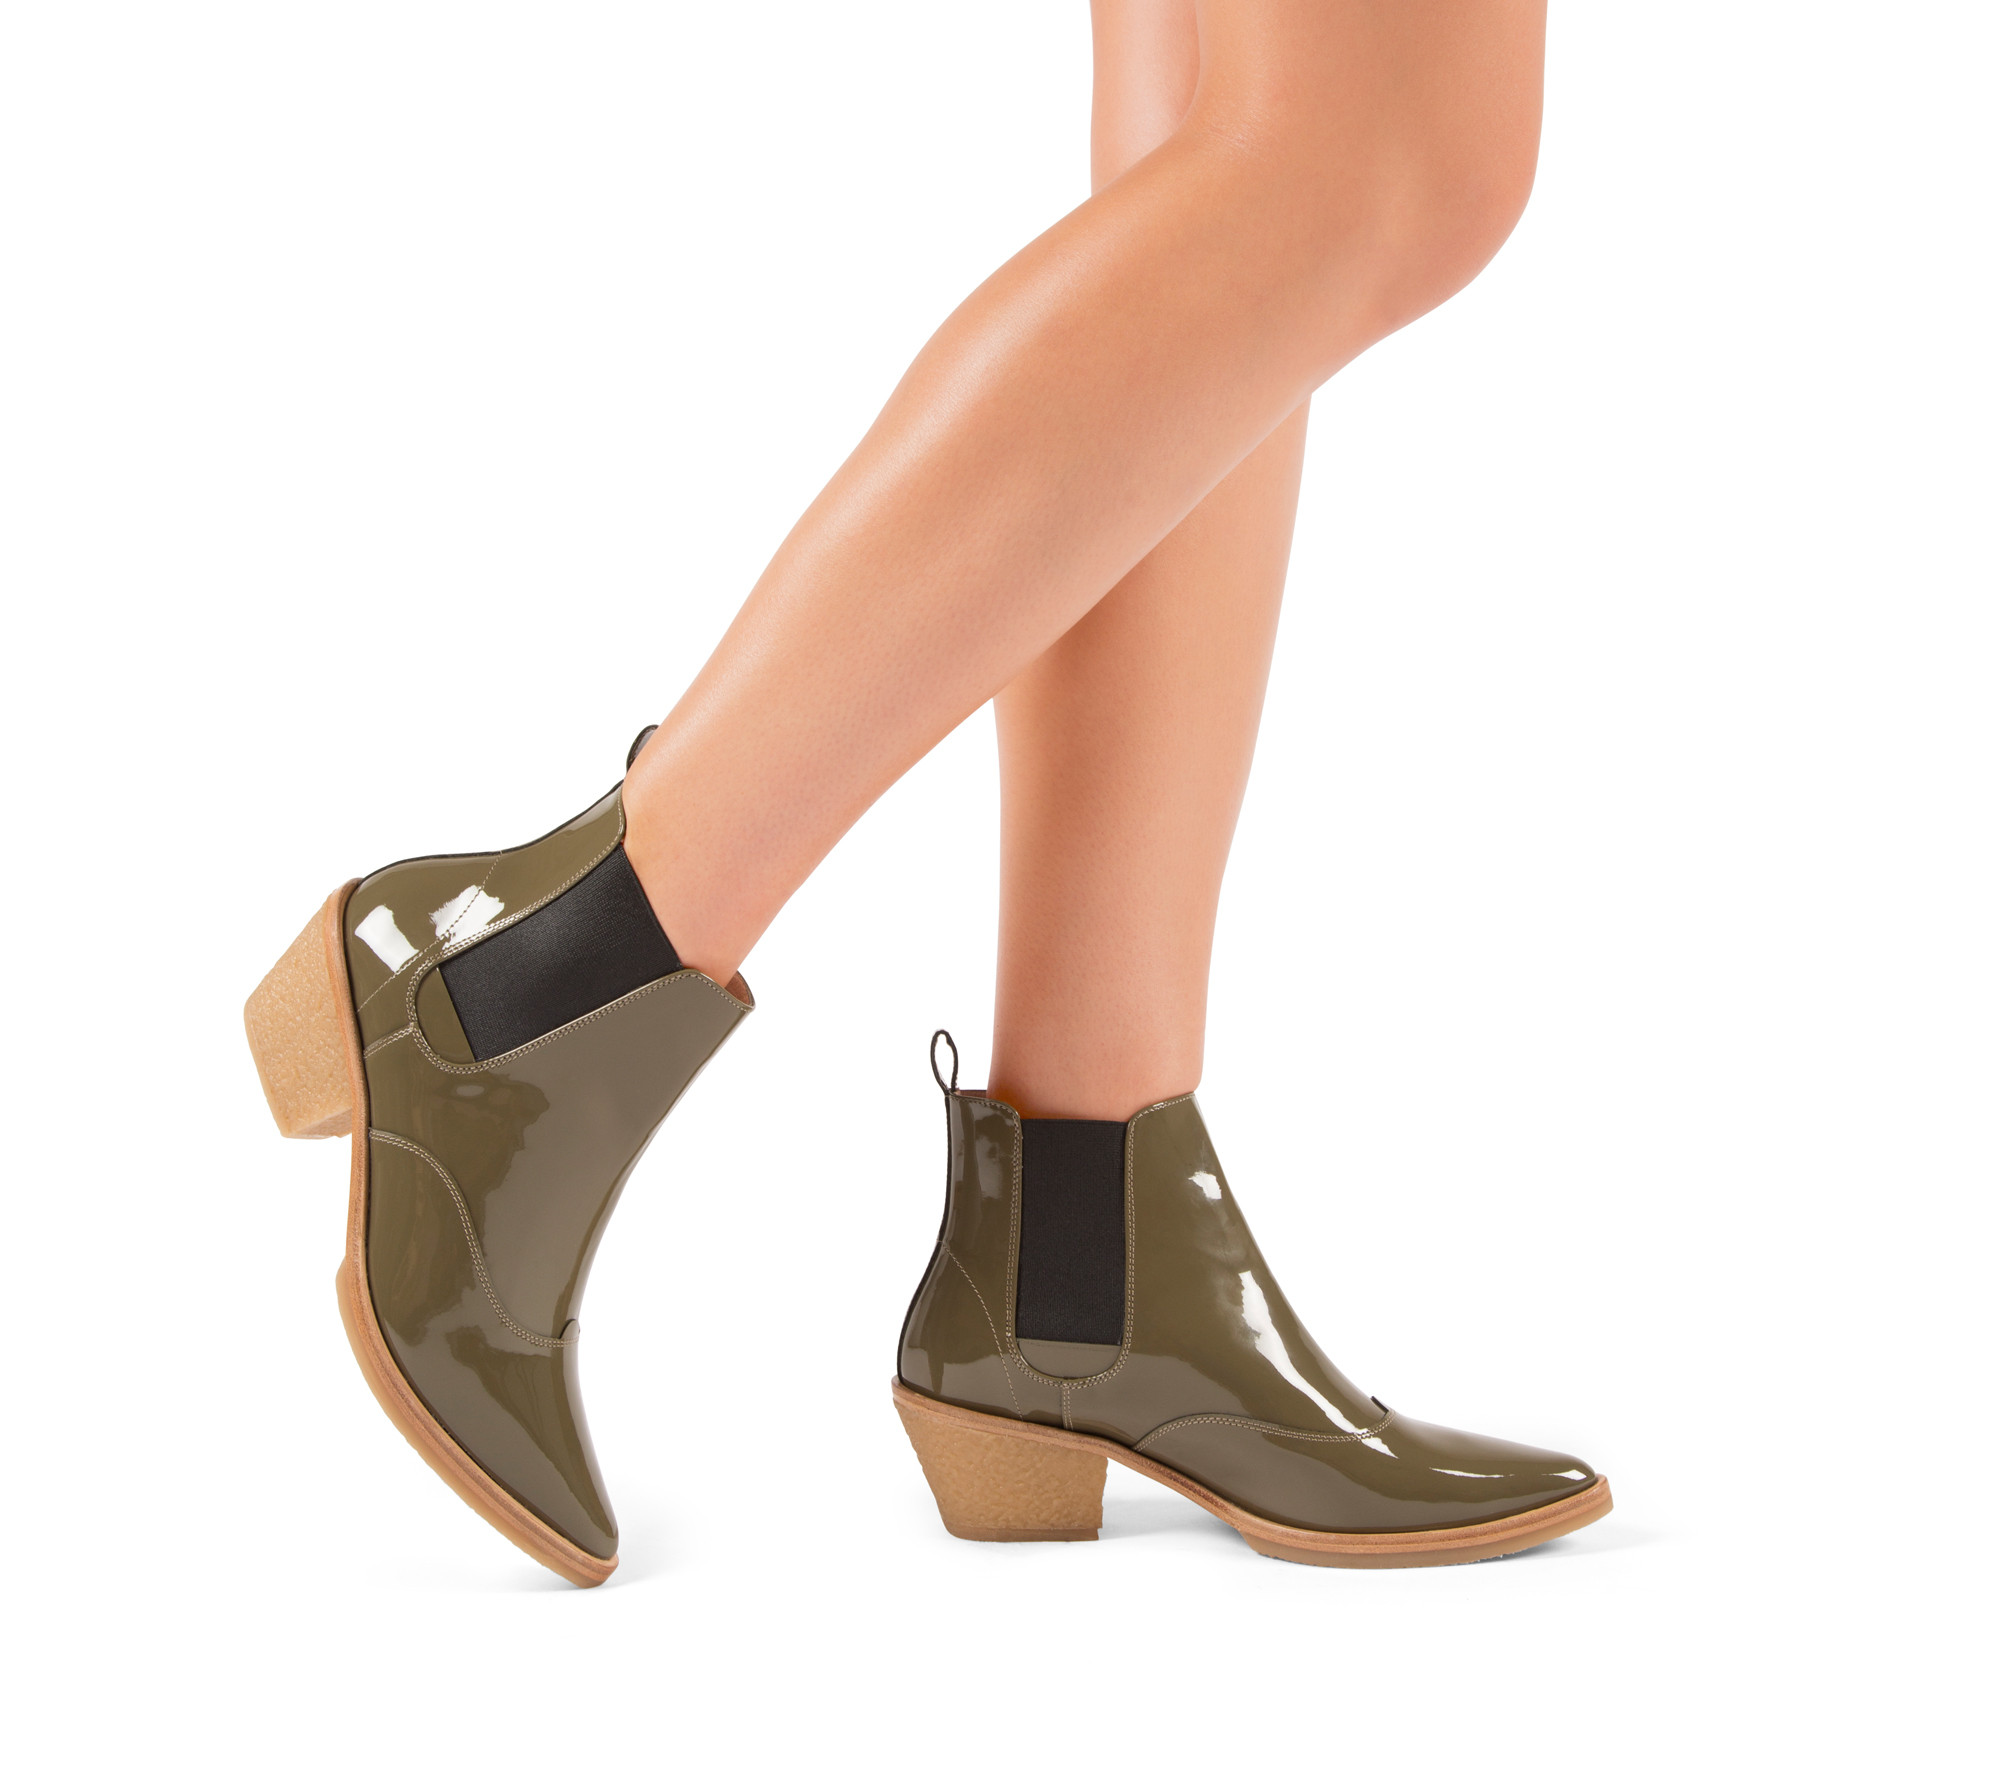 Jacques boots